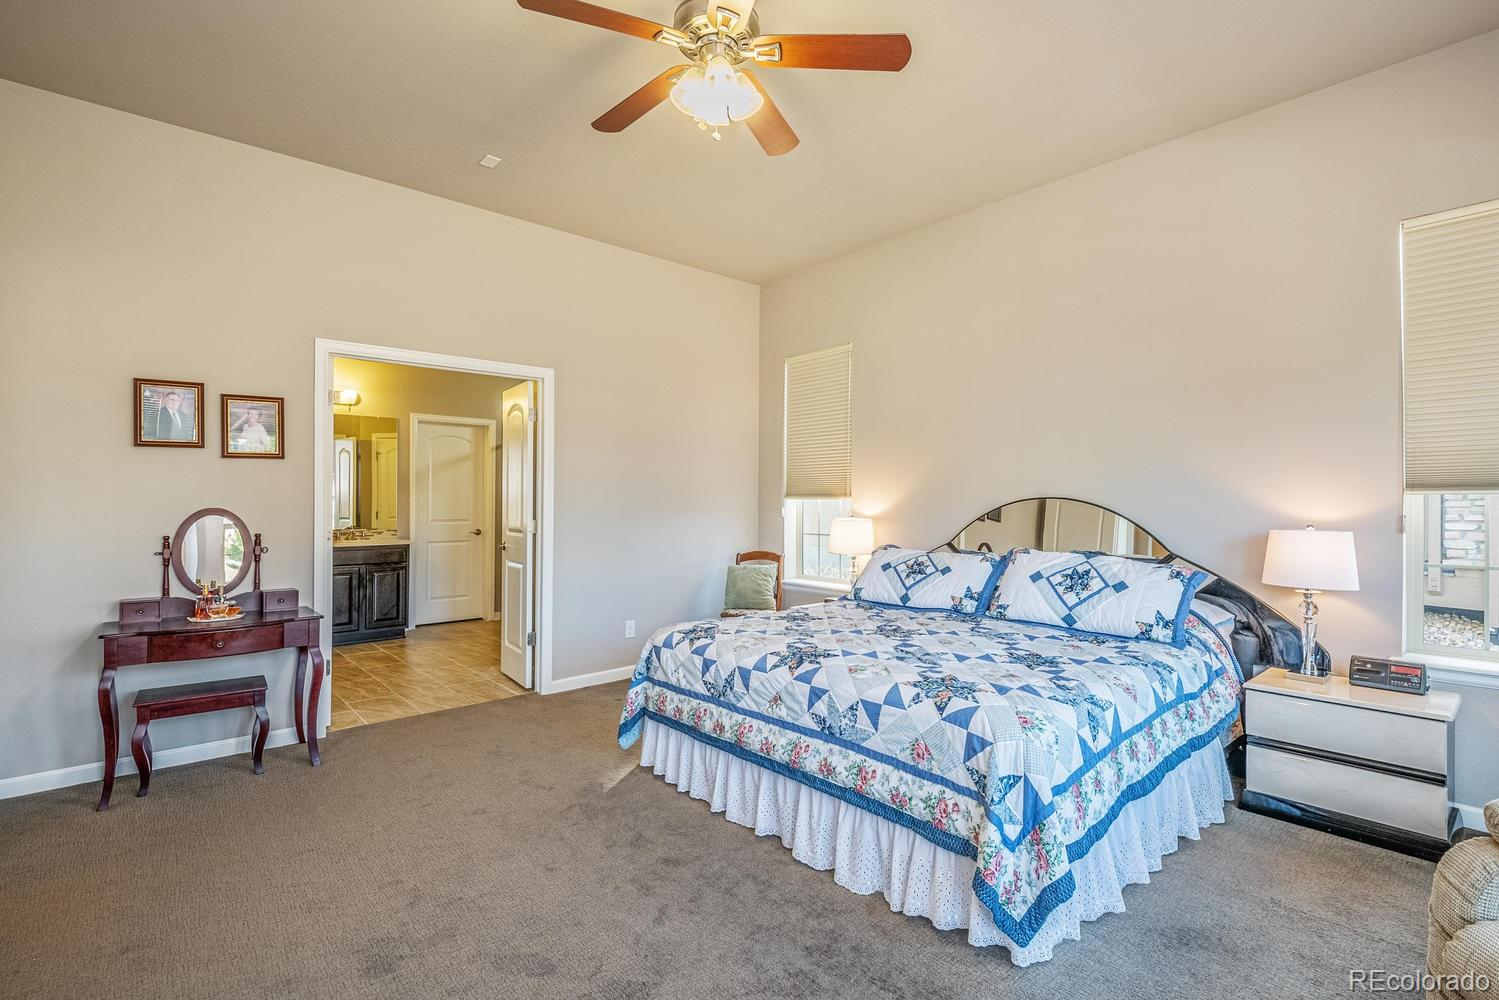 MLS# 8878612 - 17 - 15895 Wild Horse Drive, Broomfield, CO 80023